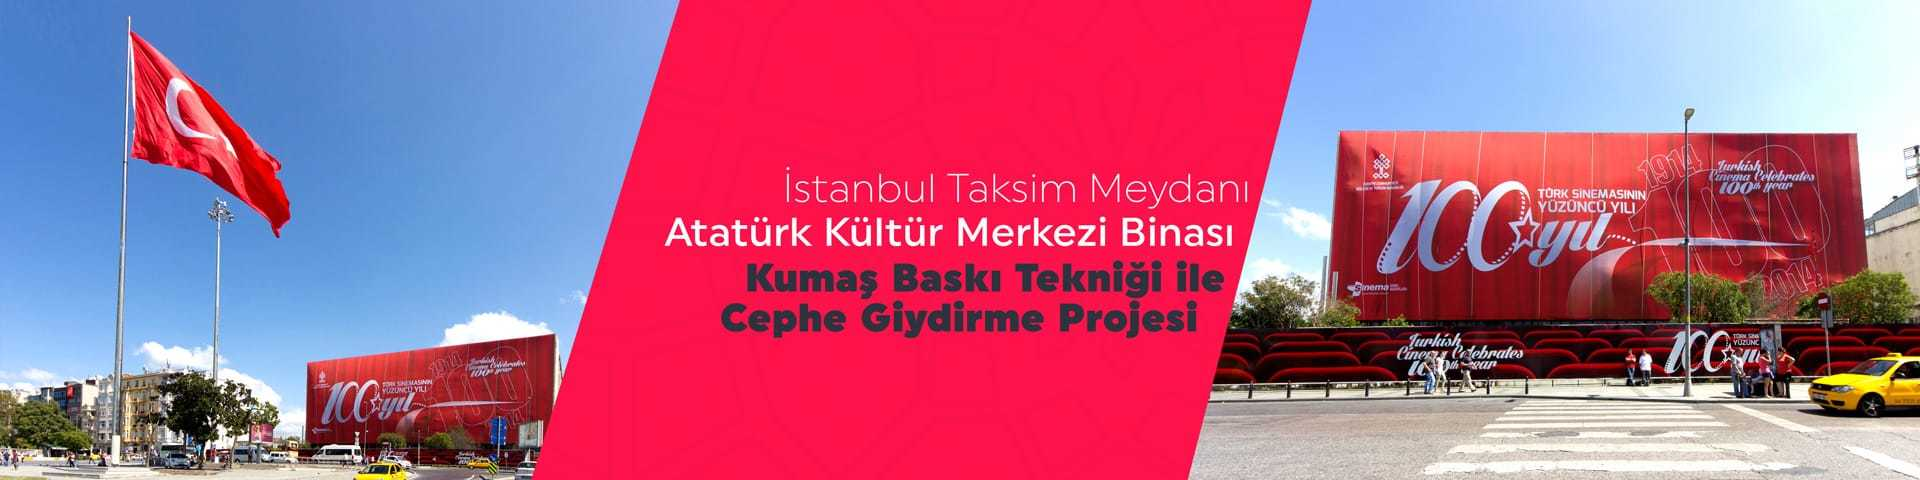 akm kumas baski 4 - İstanbul Taksim AKM Binası Giydirme